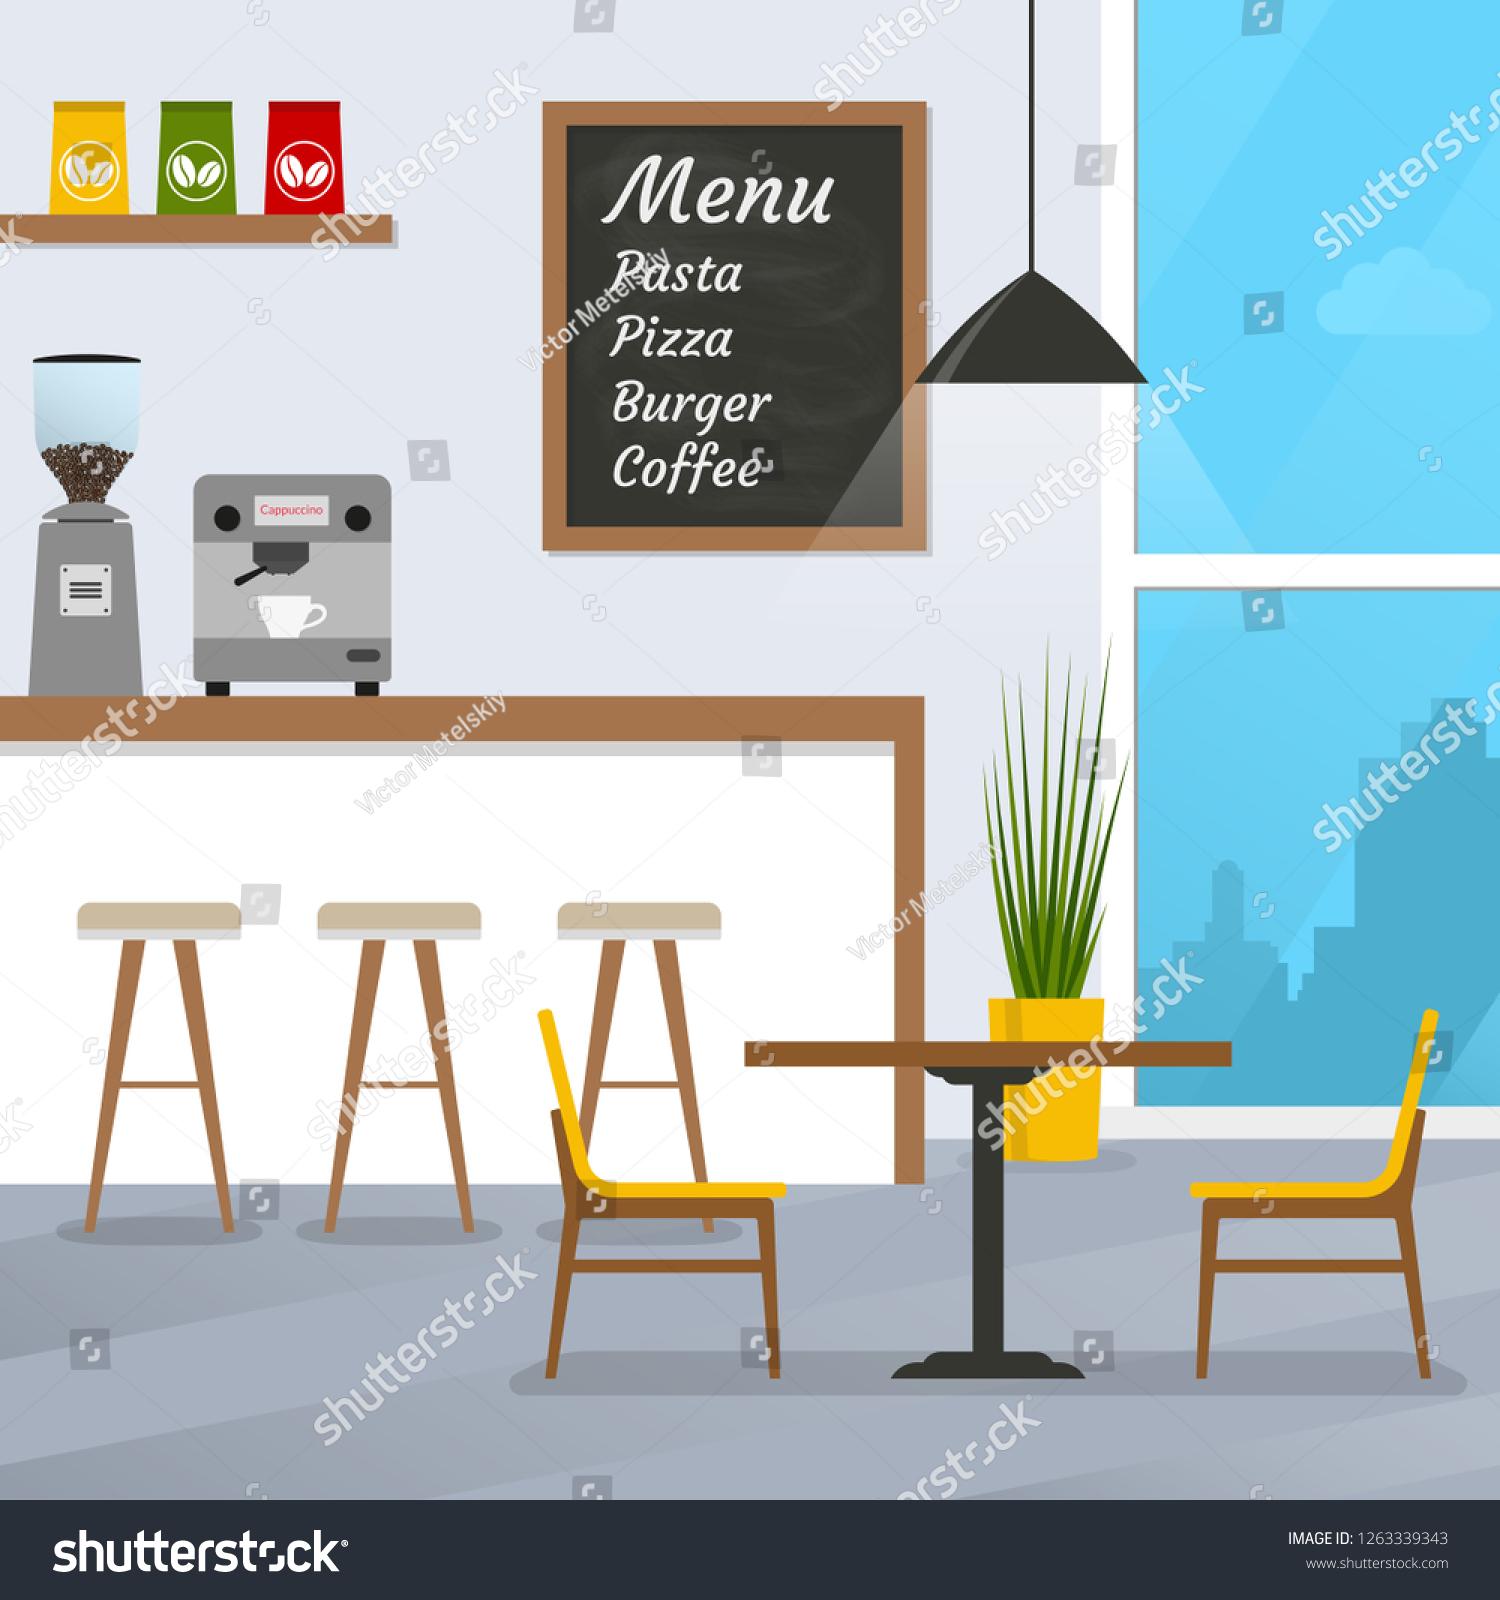 Cafe Restaurant Interior Design Coffee Shop Stock Illustration 1263339343